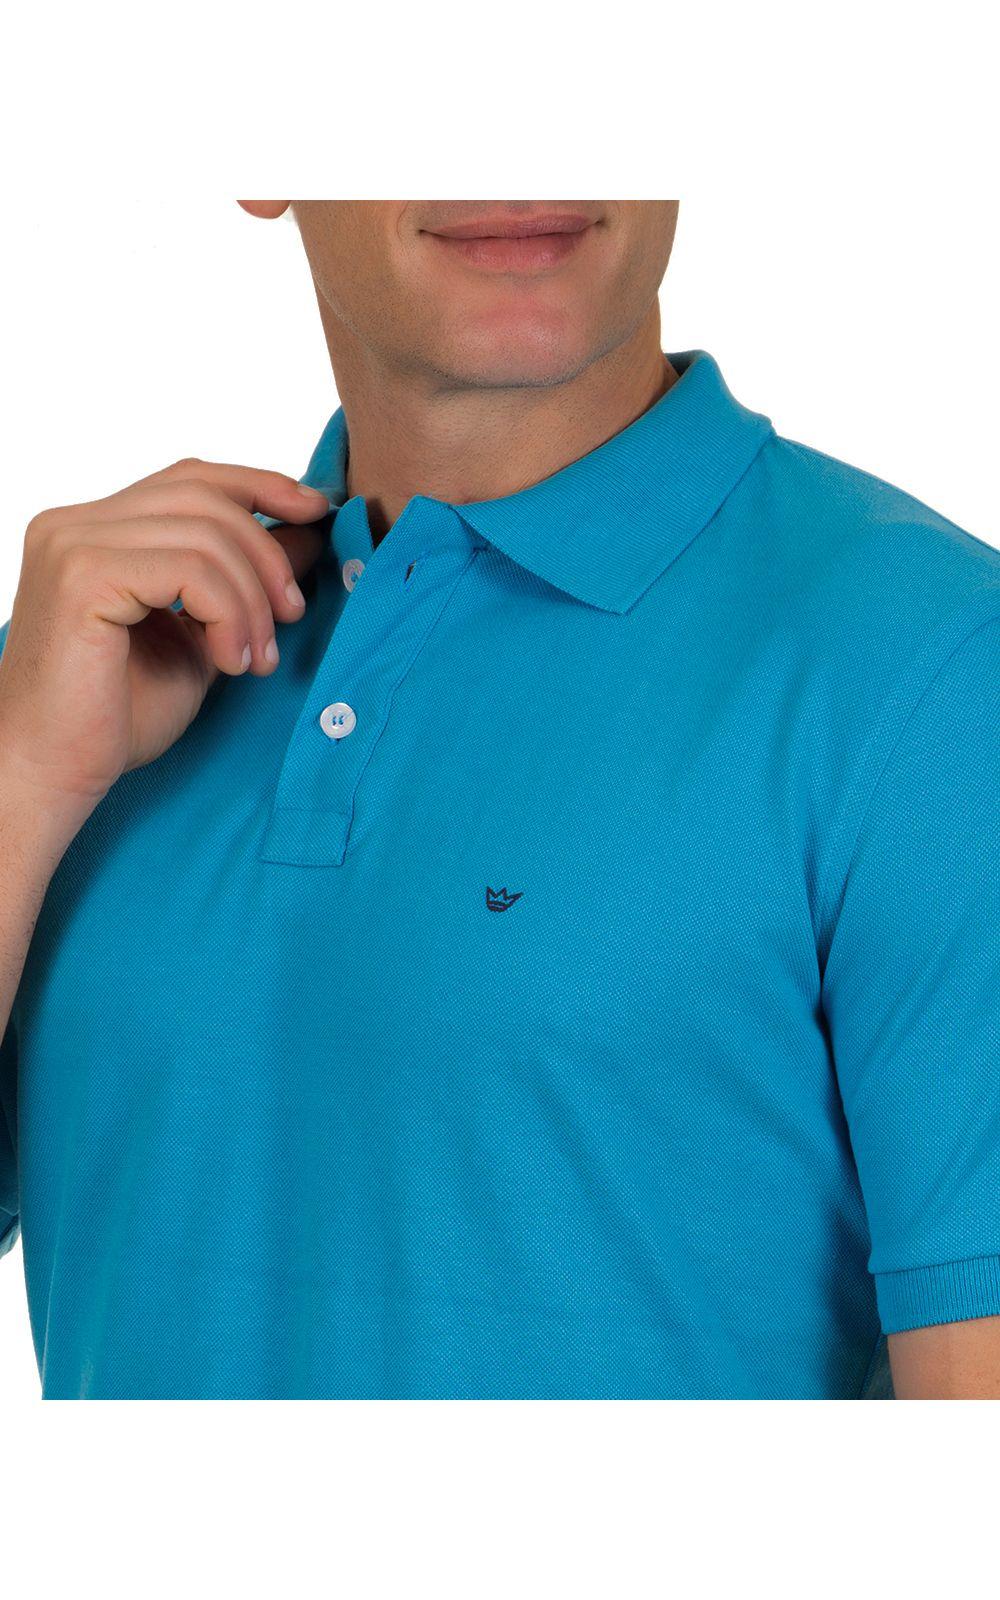 Foto 3 - Camisa Polo Masculina Azul Claro Lisa